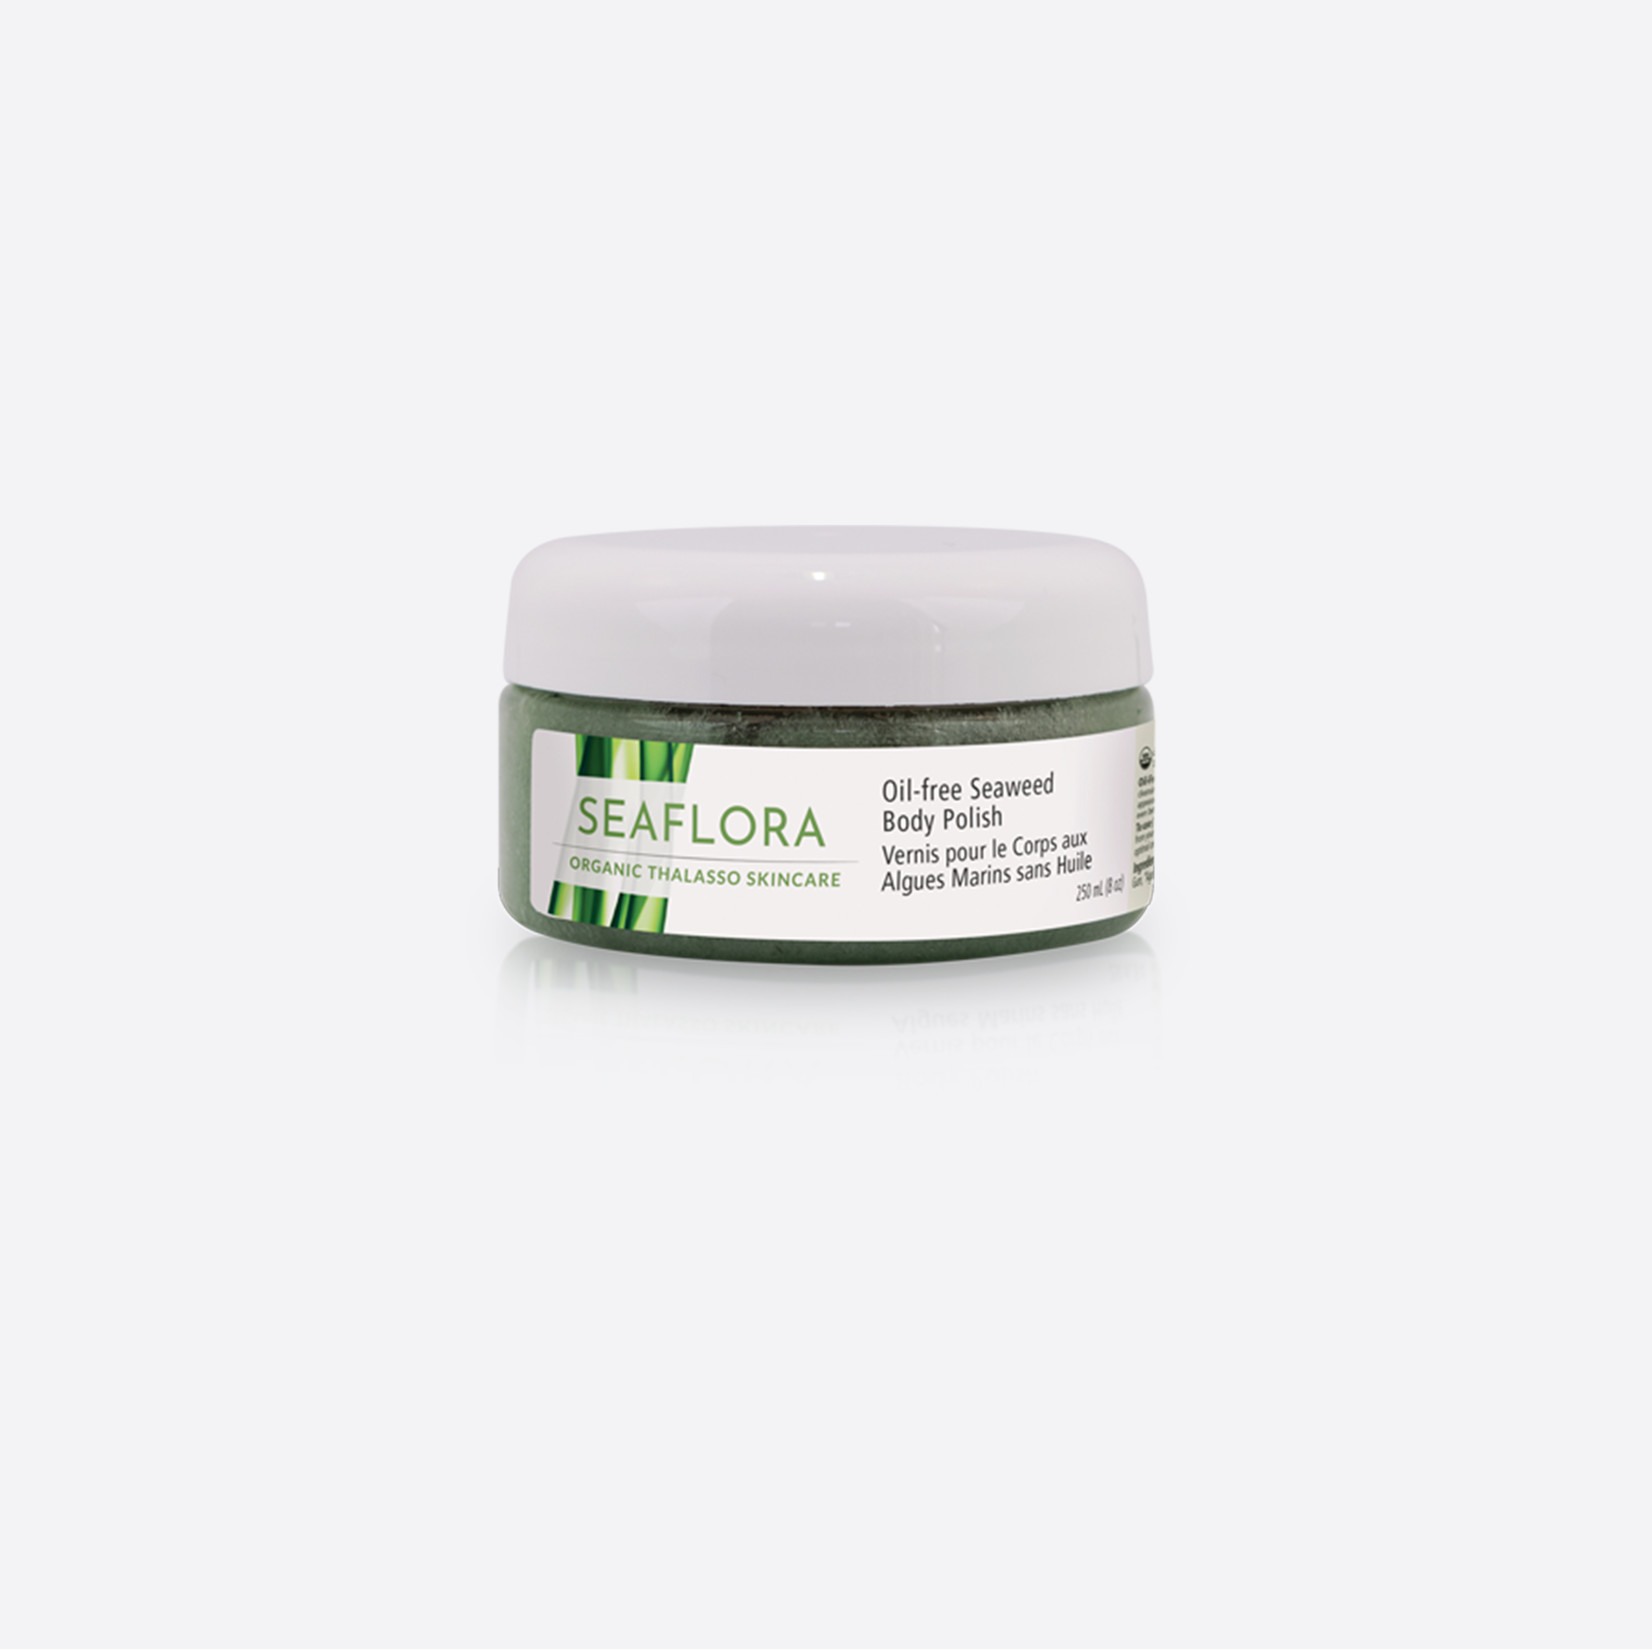 Seaflora Skincare Oil-Free Seaweed Body Polish